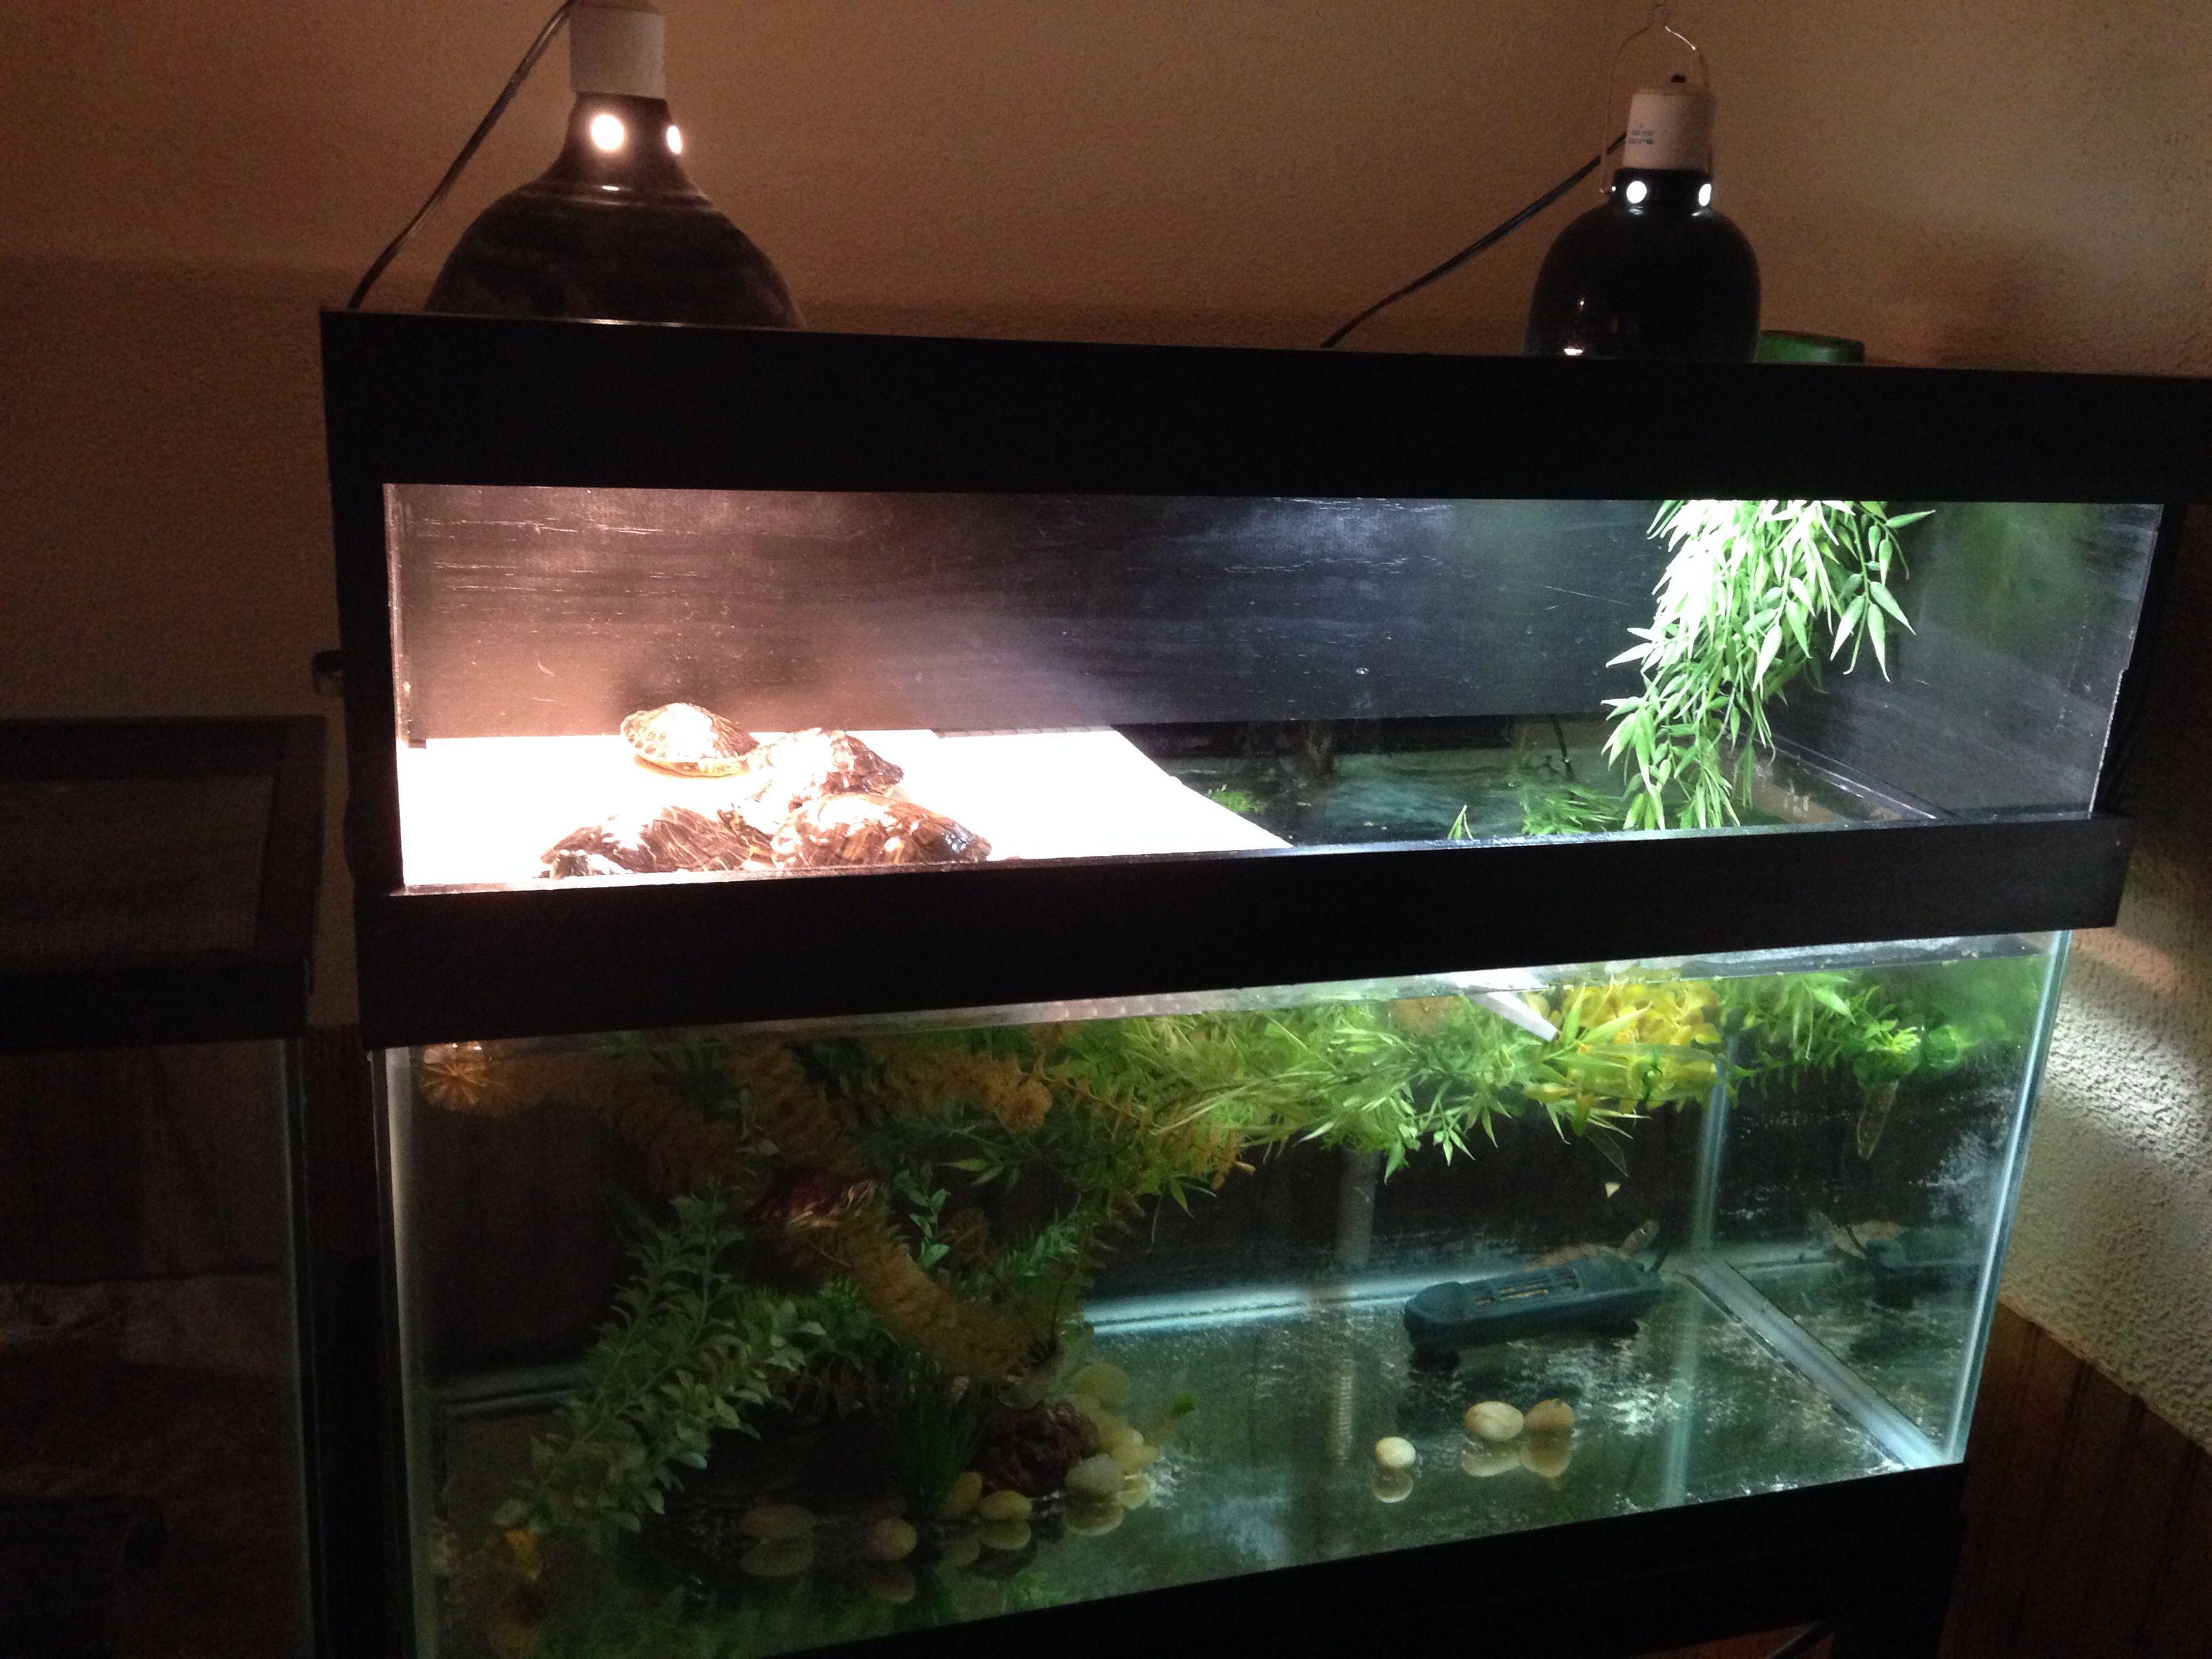 Diy turtle tank topper My projects Pinterest